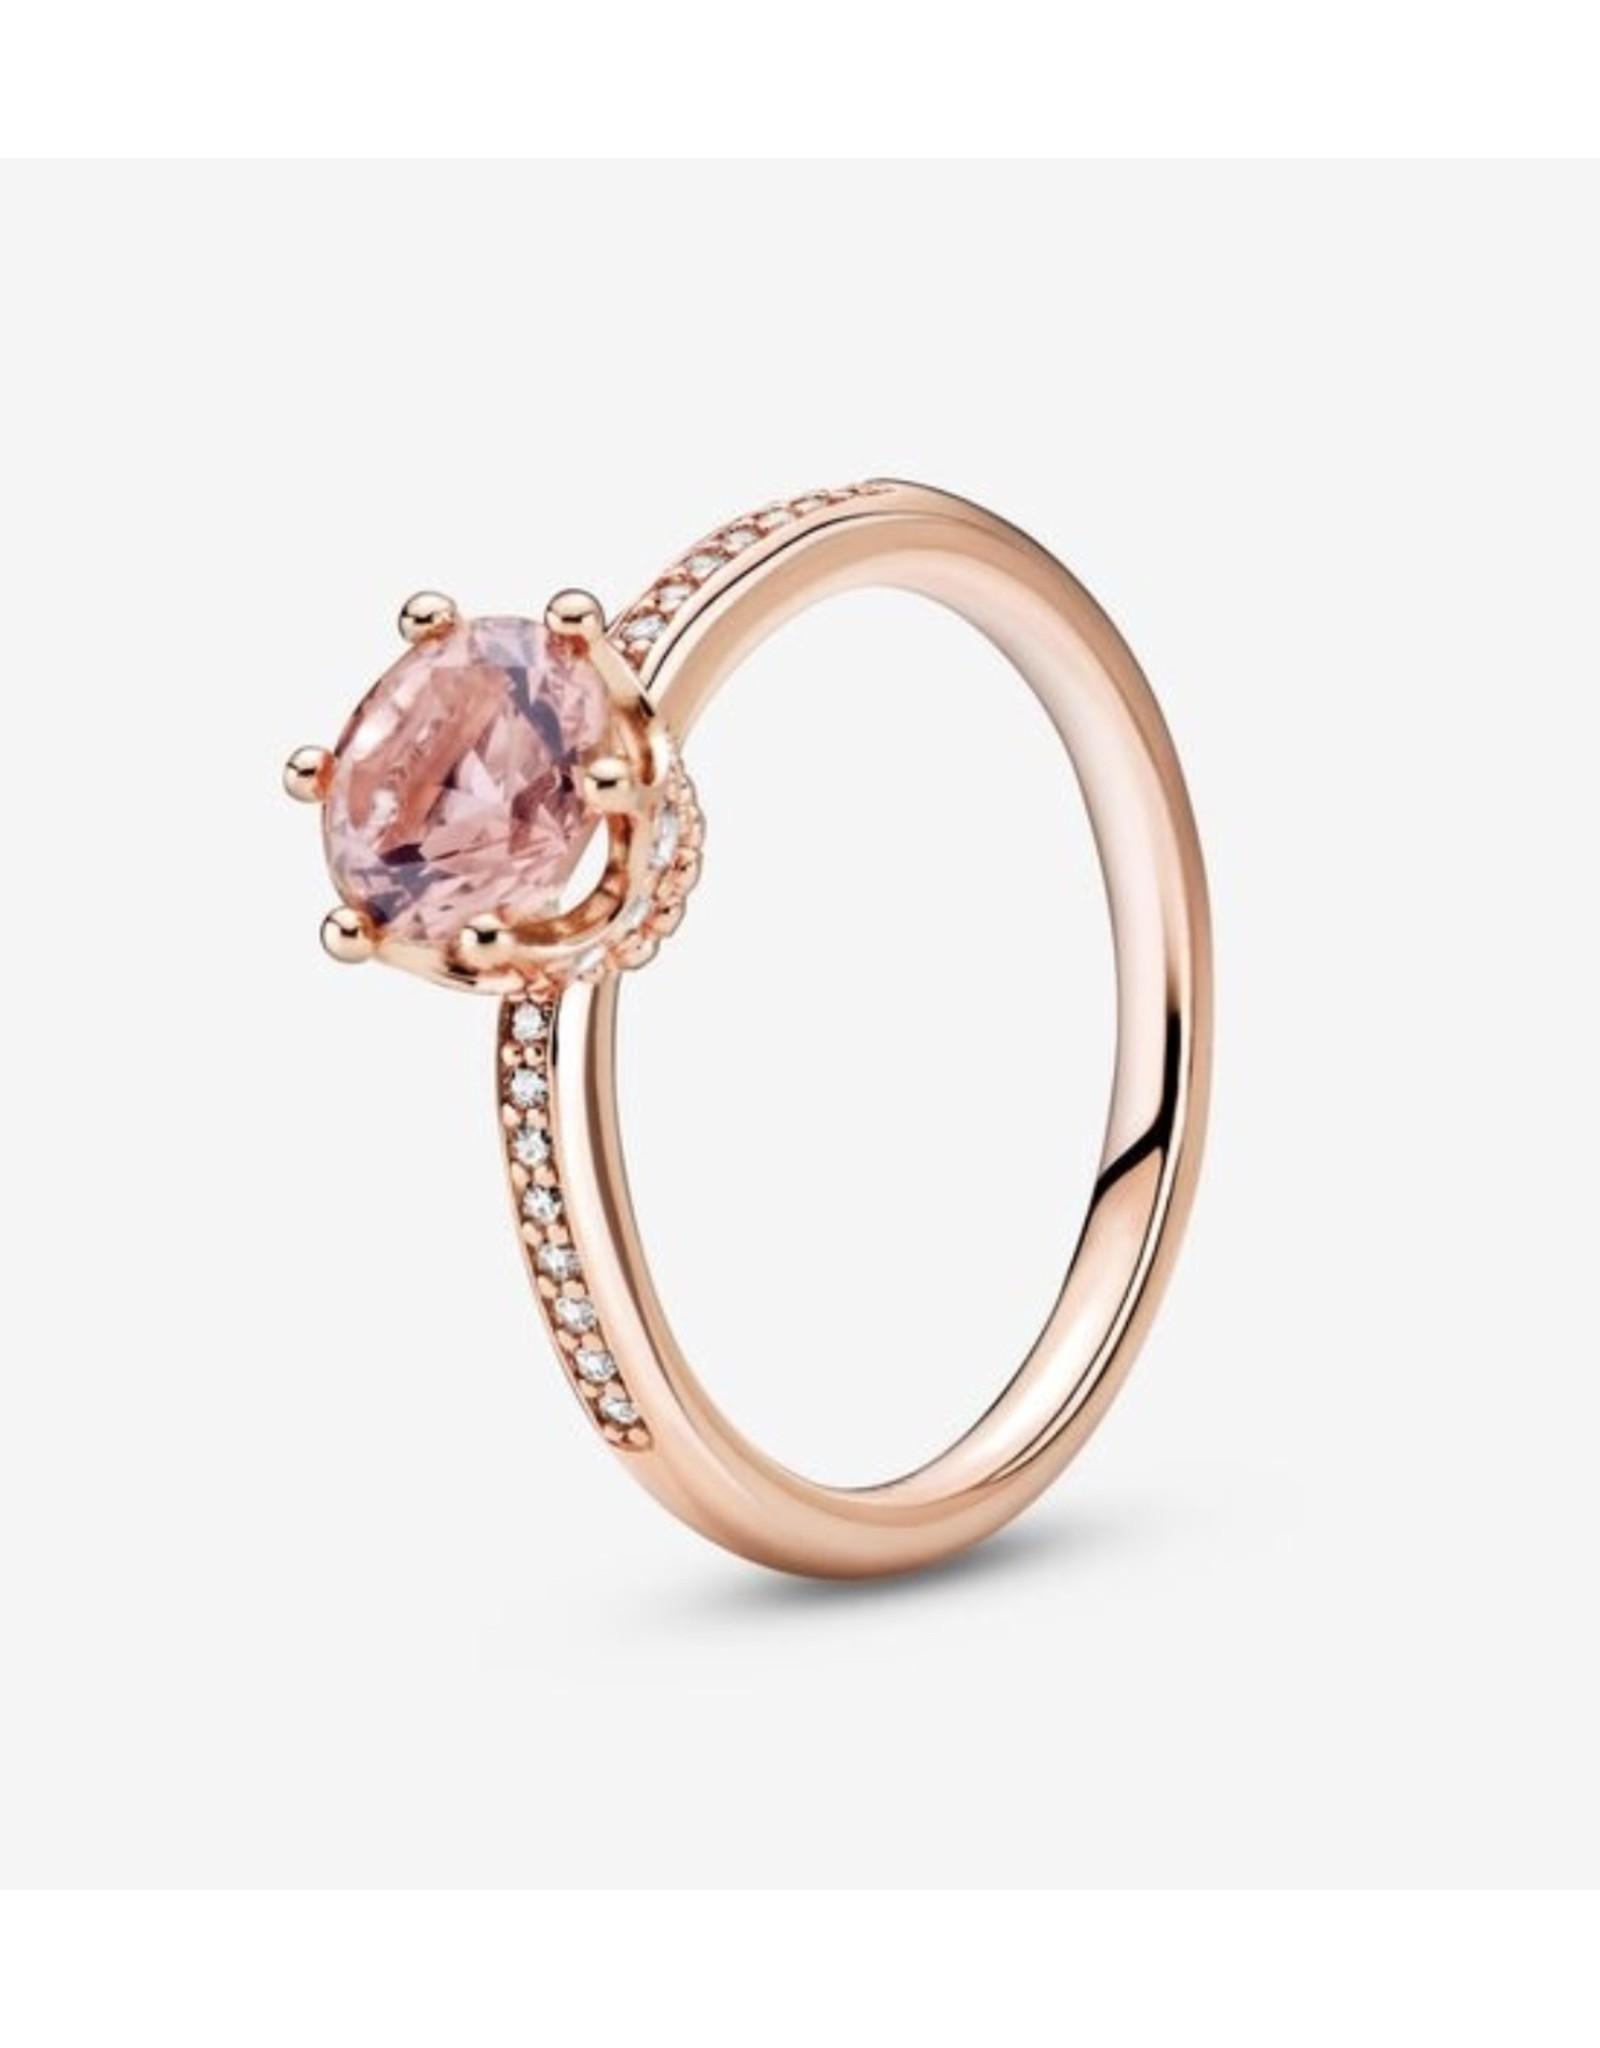 Pandora Pandora Ring,188289C01, Sparkling Crown Solitaire, Pink Crystal&Clear CZ